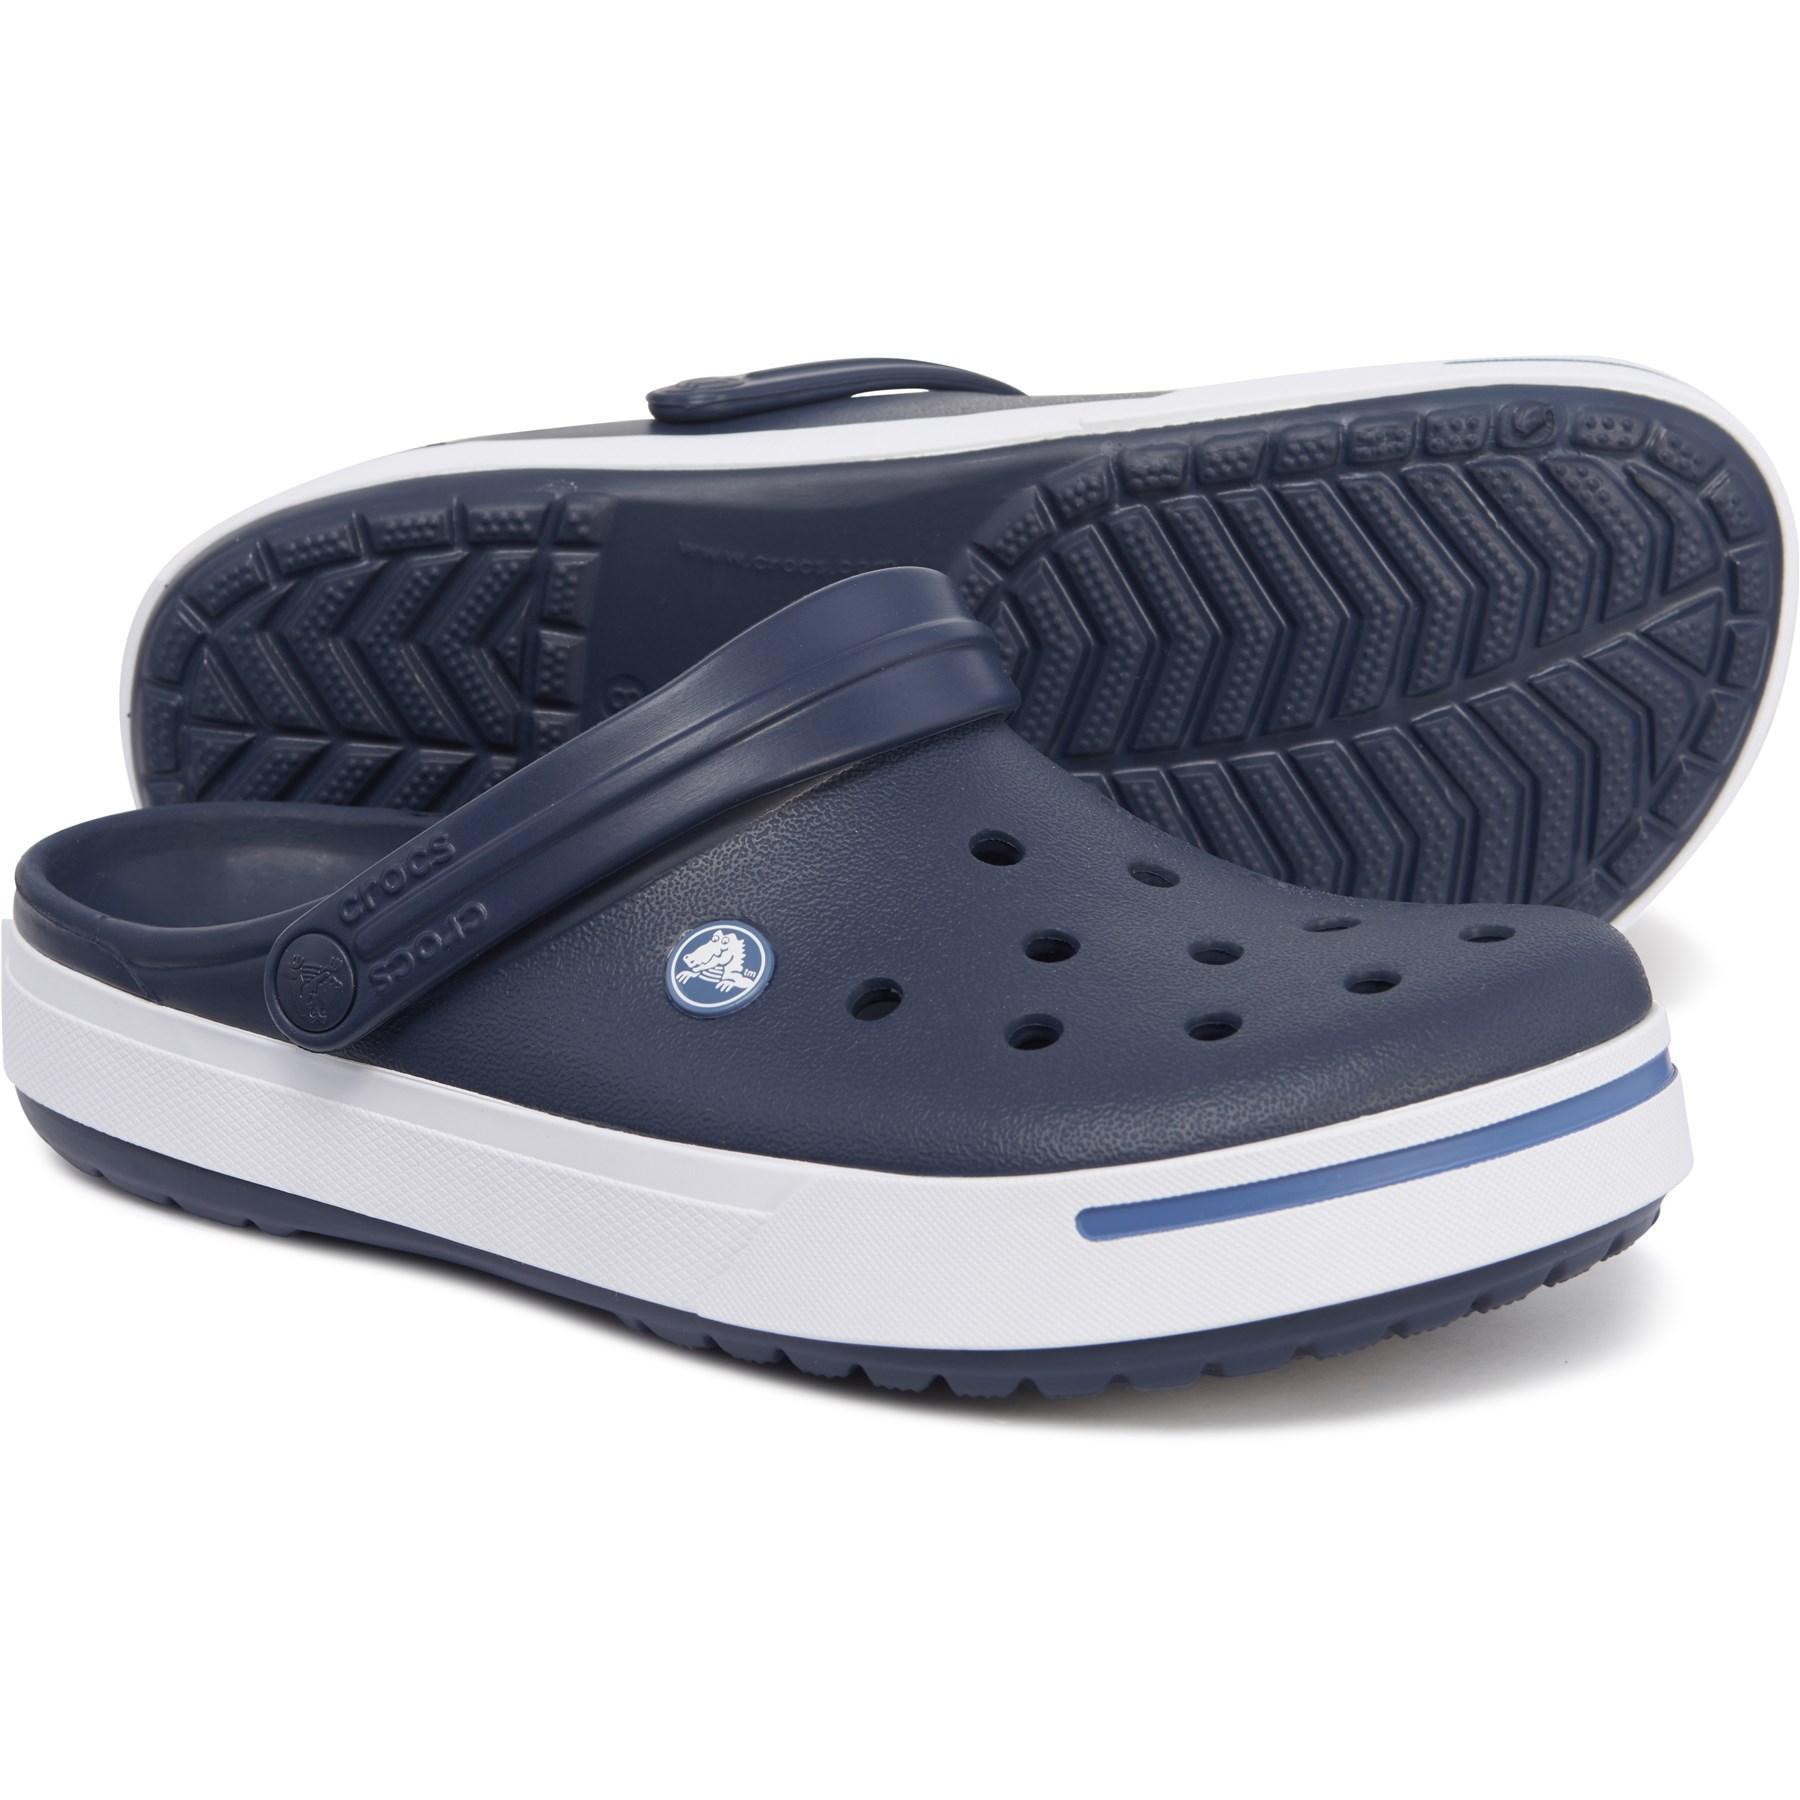 39b61a8a32997 Lyst - Crocs™ Crocband Ii Clogs (for Men) in Blue for Men